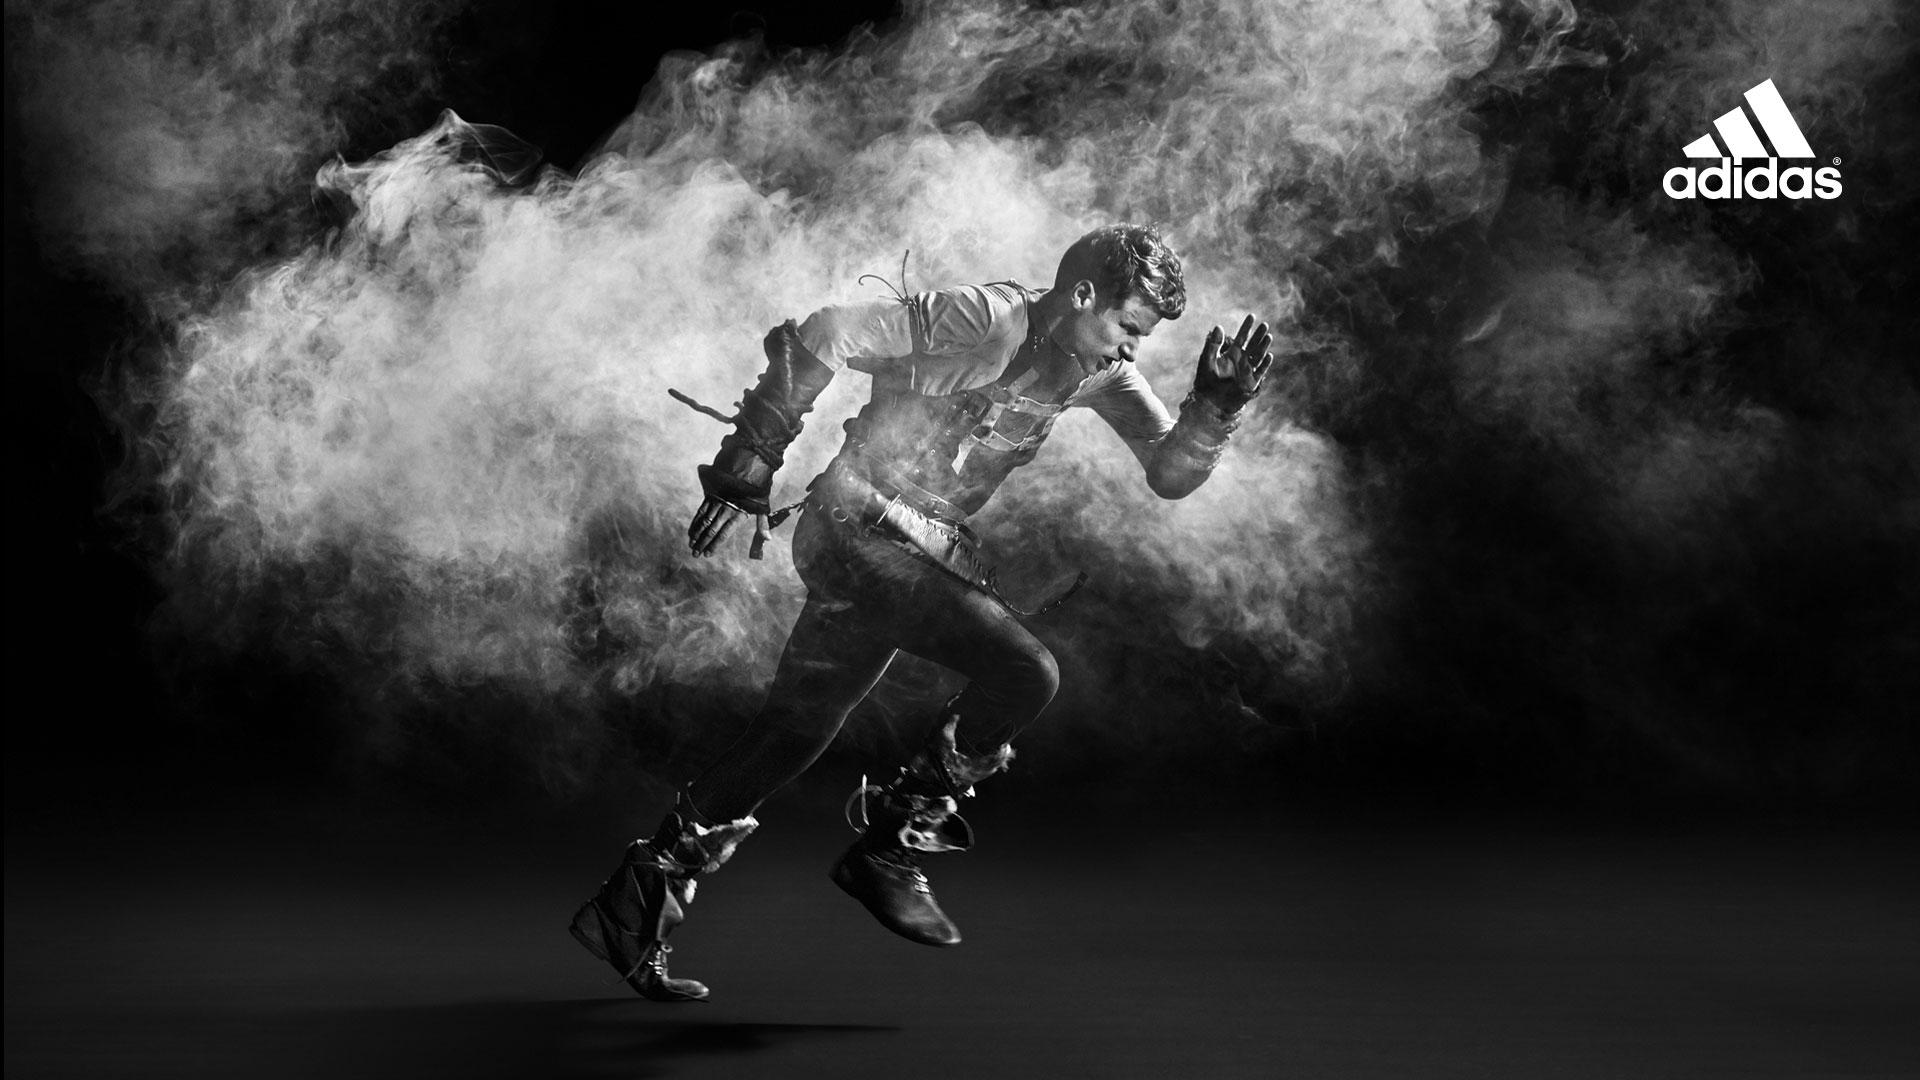 Adidas_Battle_Pack_03